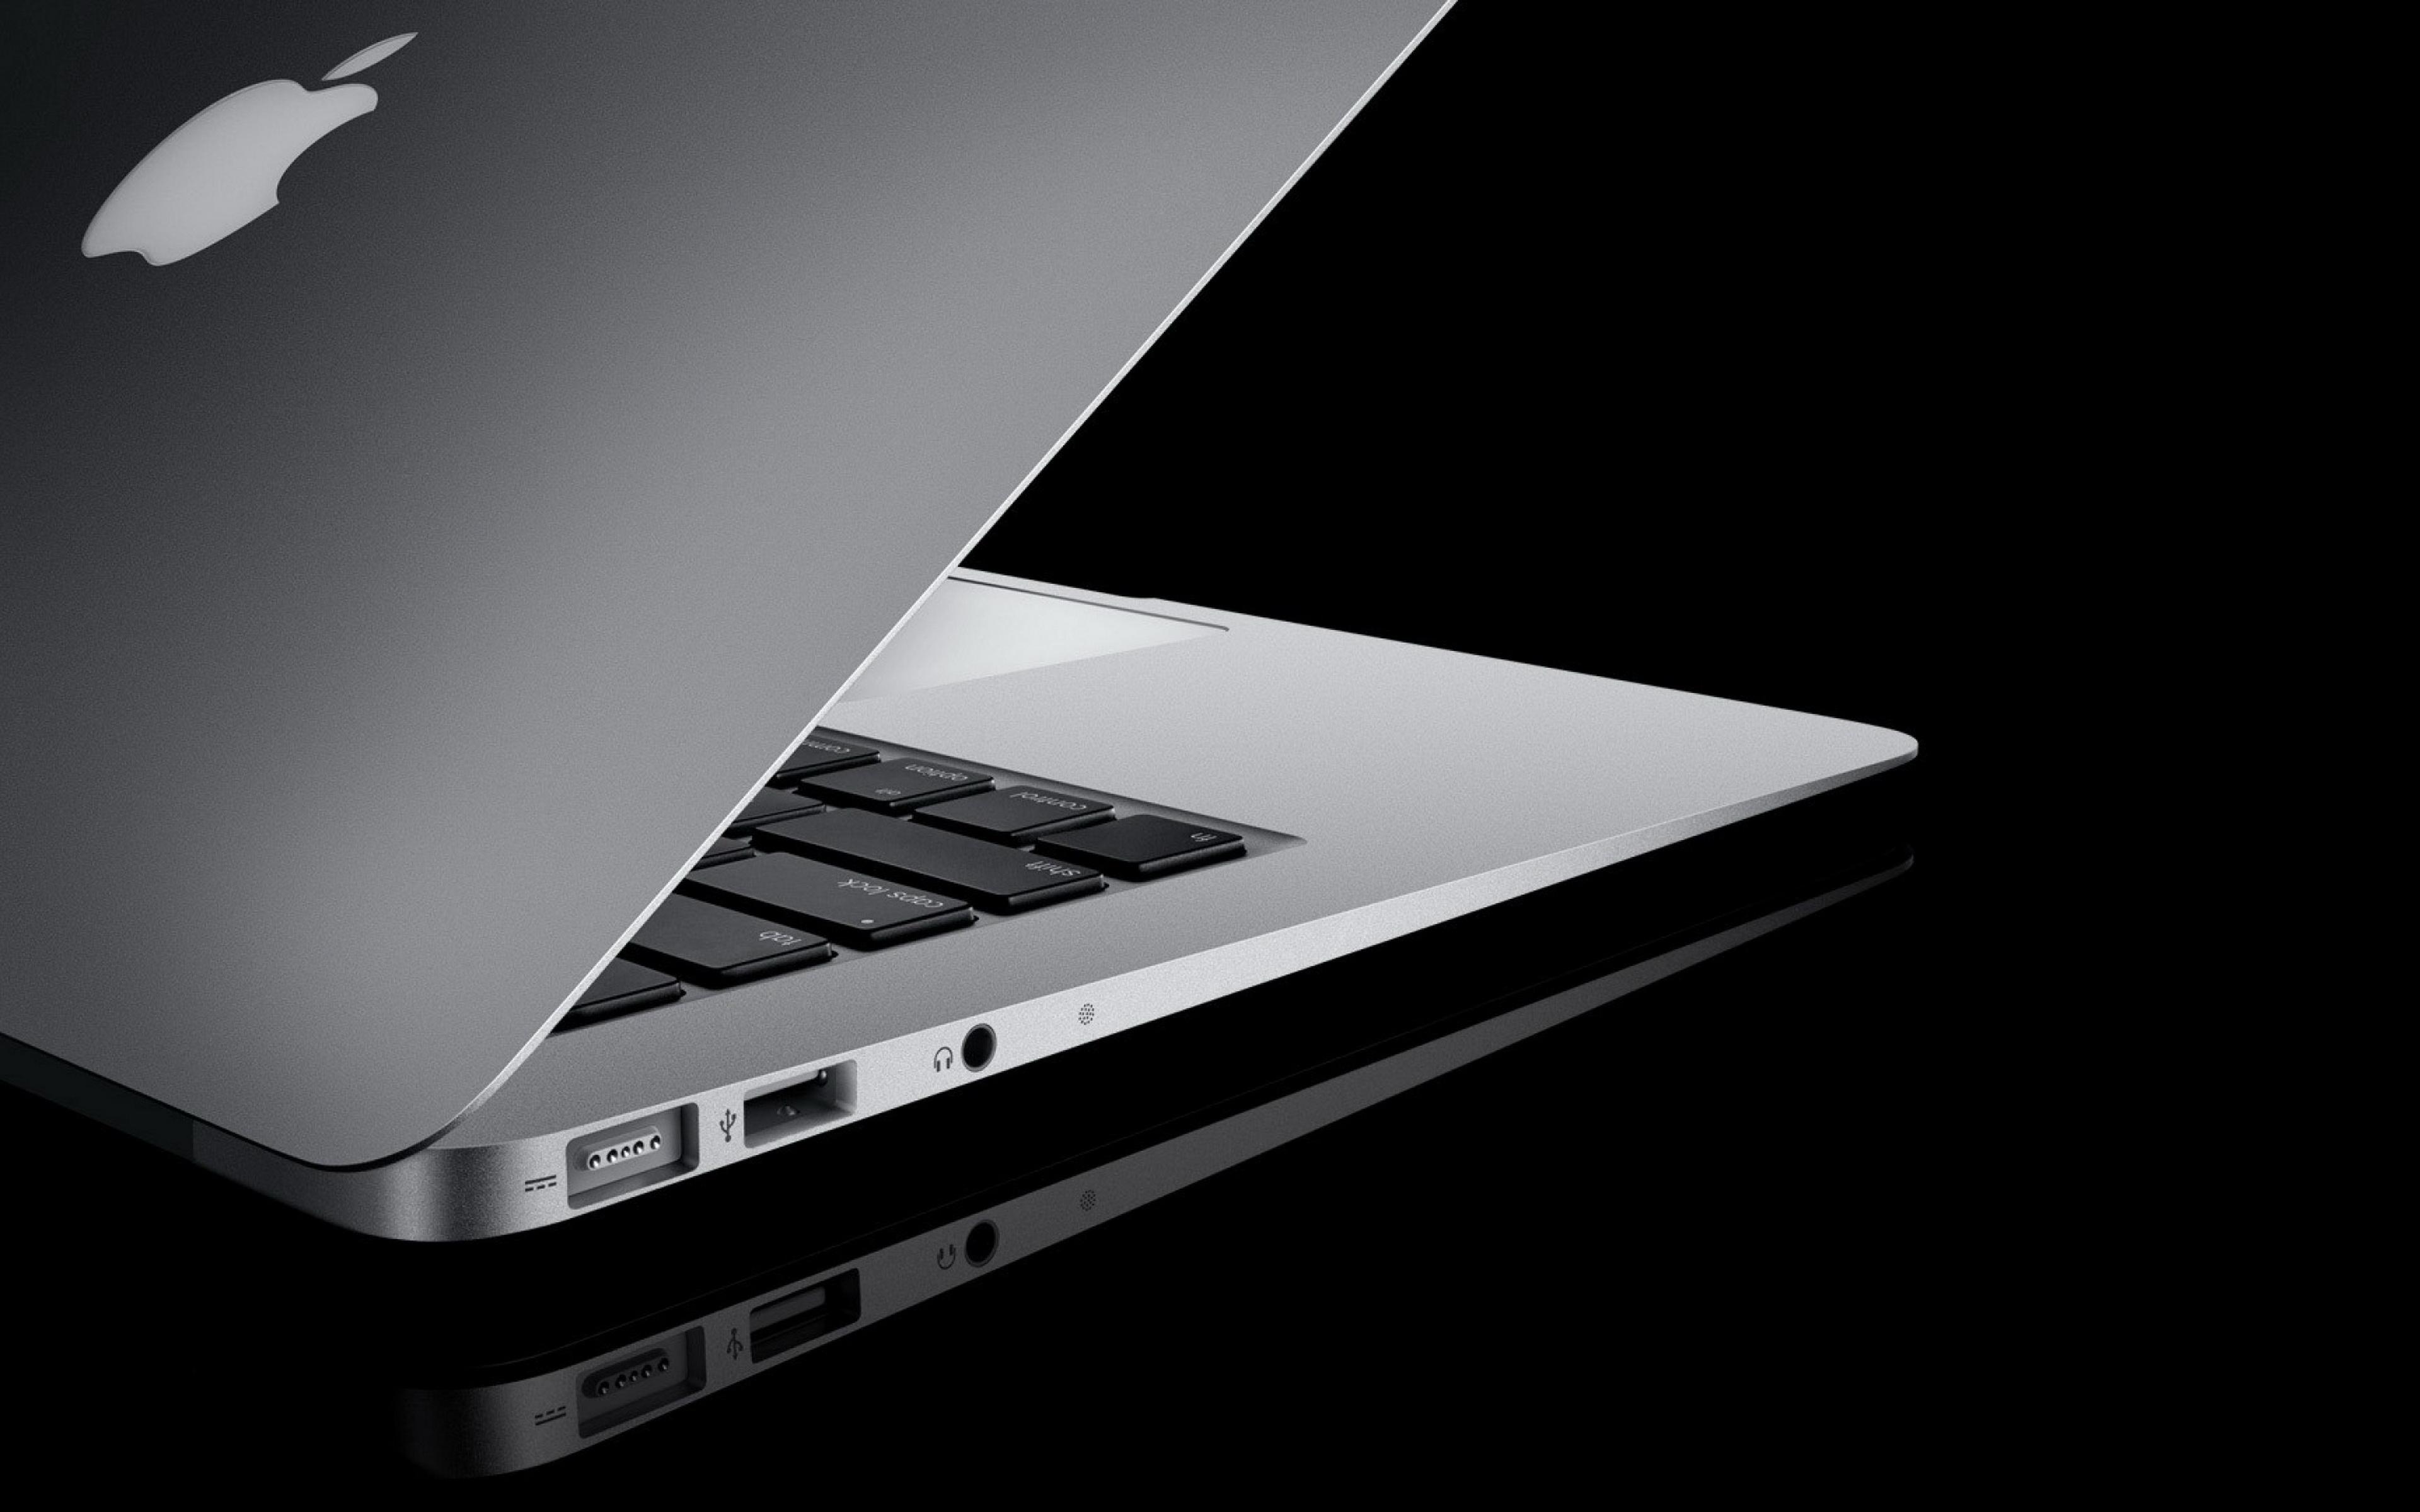 Macbook 4k Ultra Fondo De Pantalla Hd Fondo De Escritorio